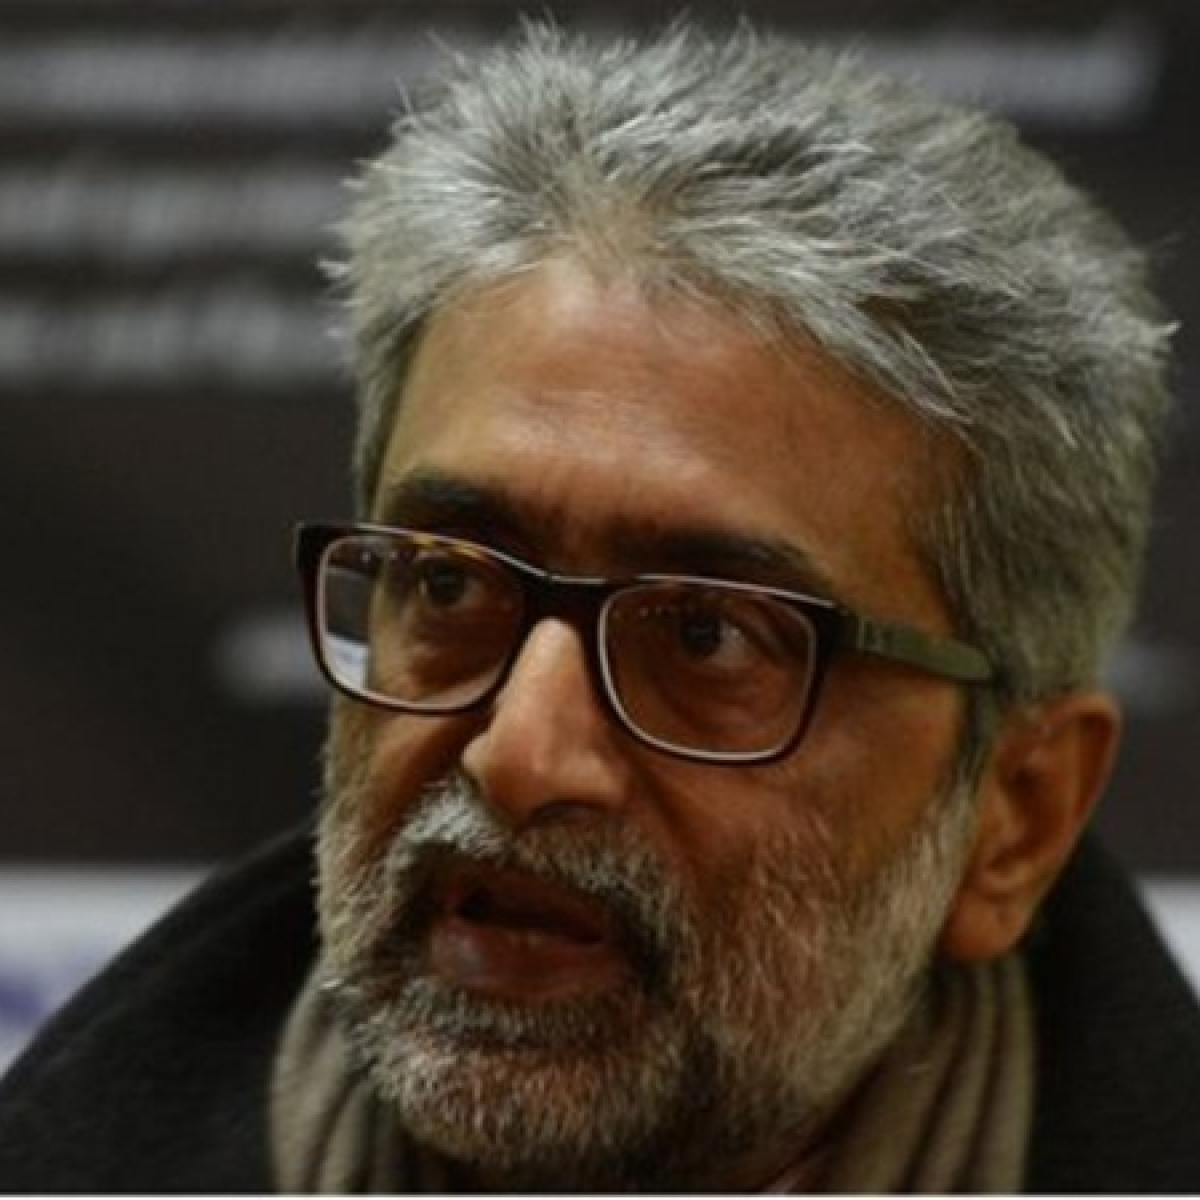 Elgar Parishad case: Bombay High Court seeks NIA's reply on Gautam Navlakha's bail plea